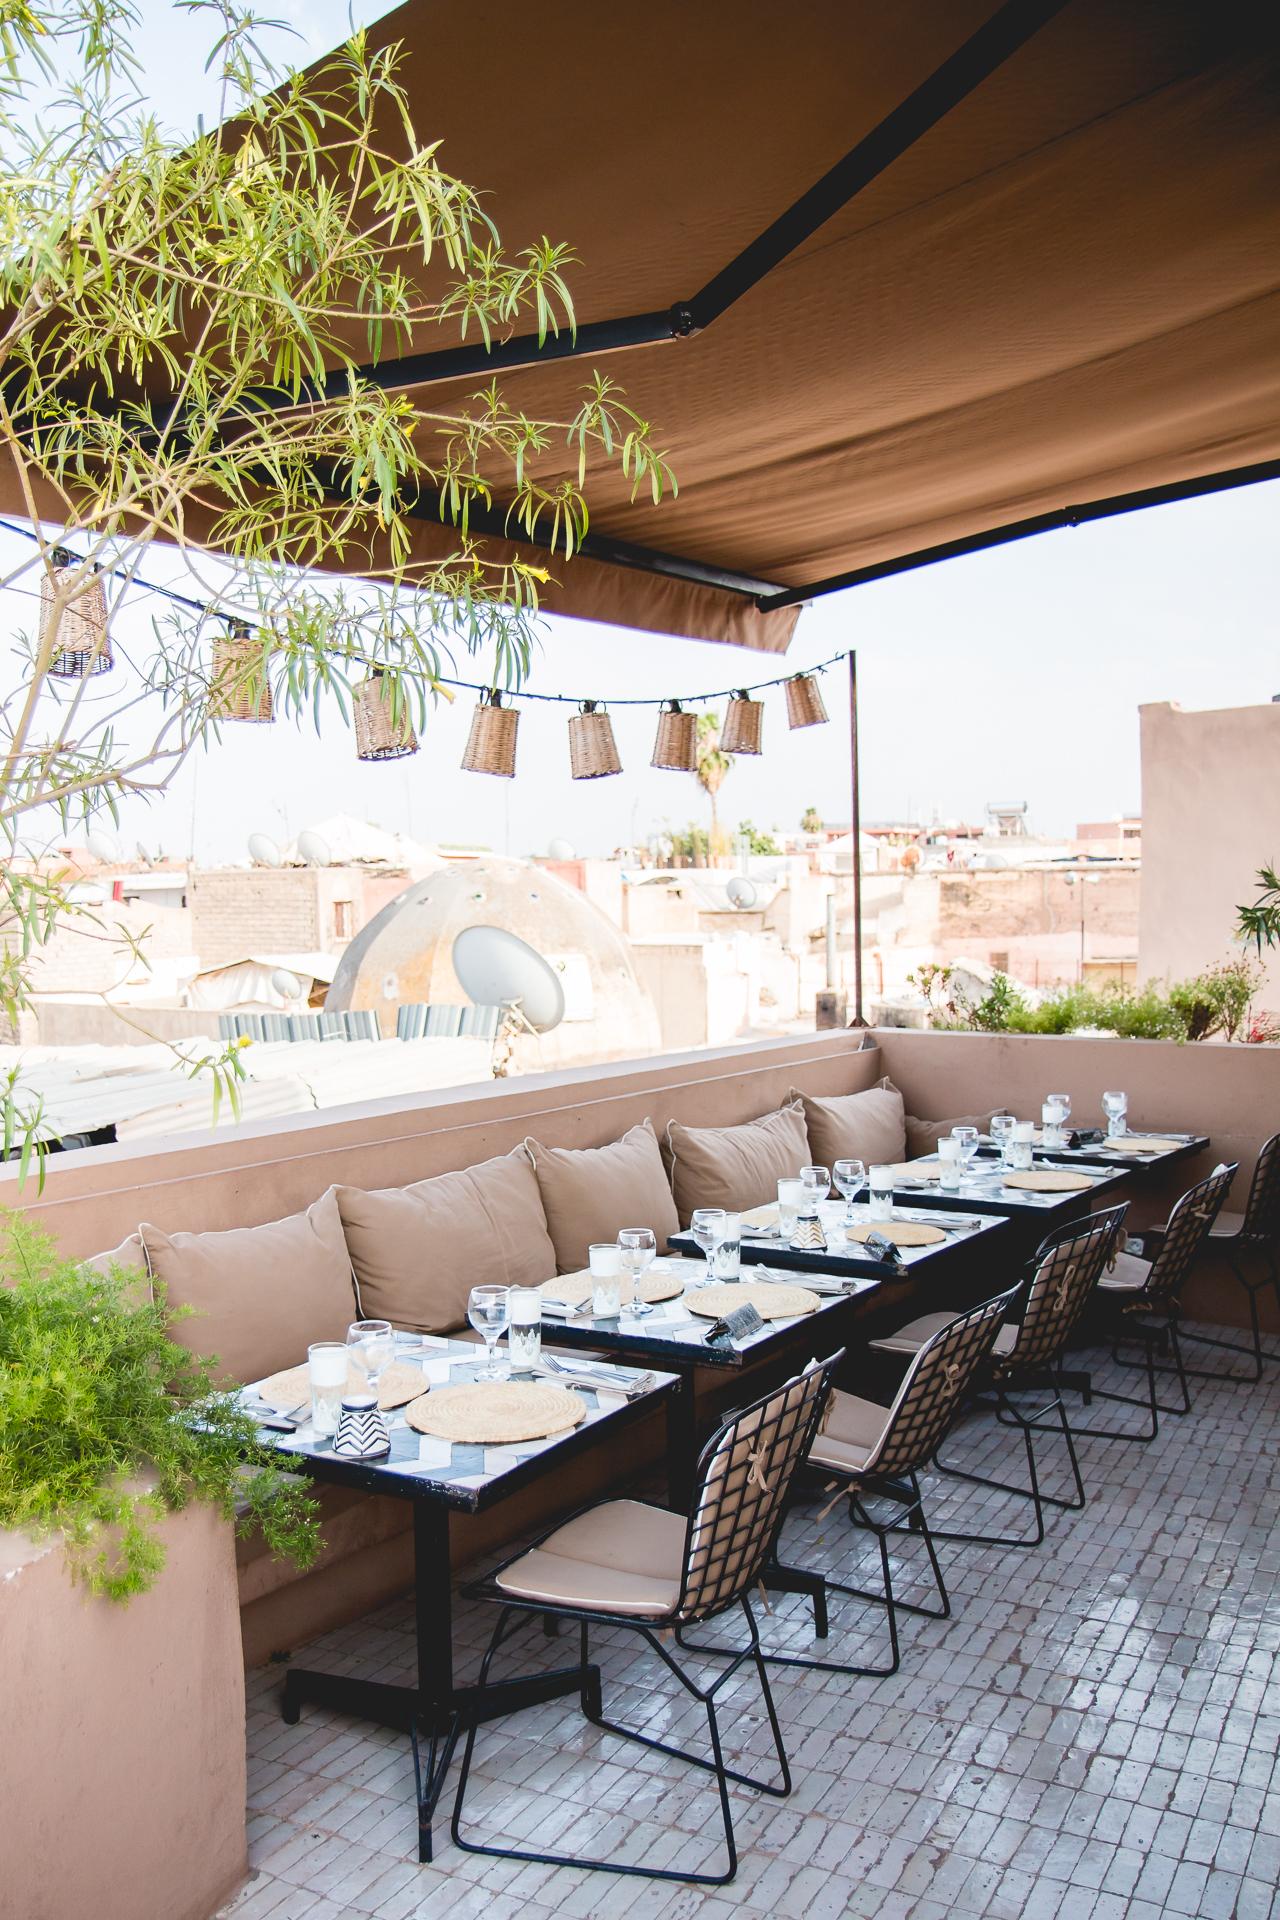 Inspire: Marrakech   The Daily Dose